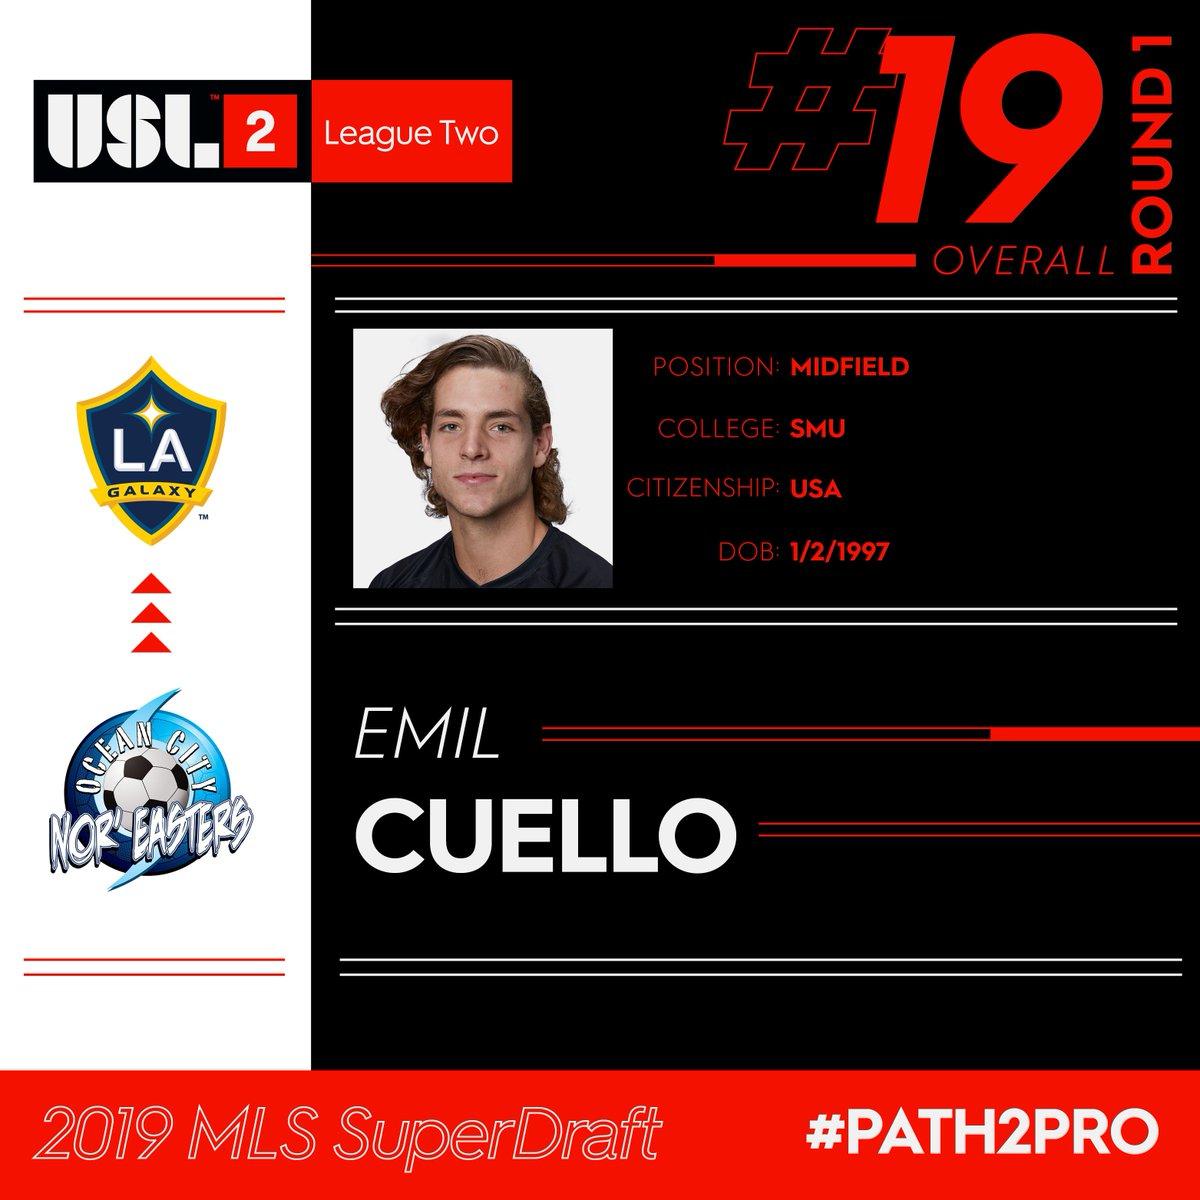 USL League Two's photo on Emil Cuello